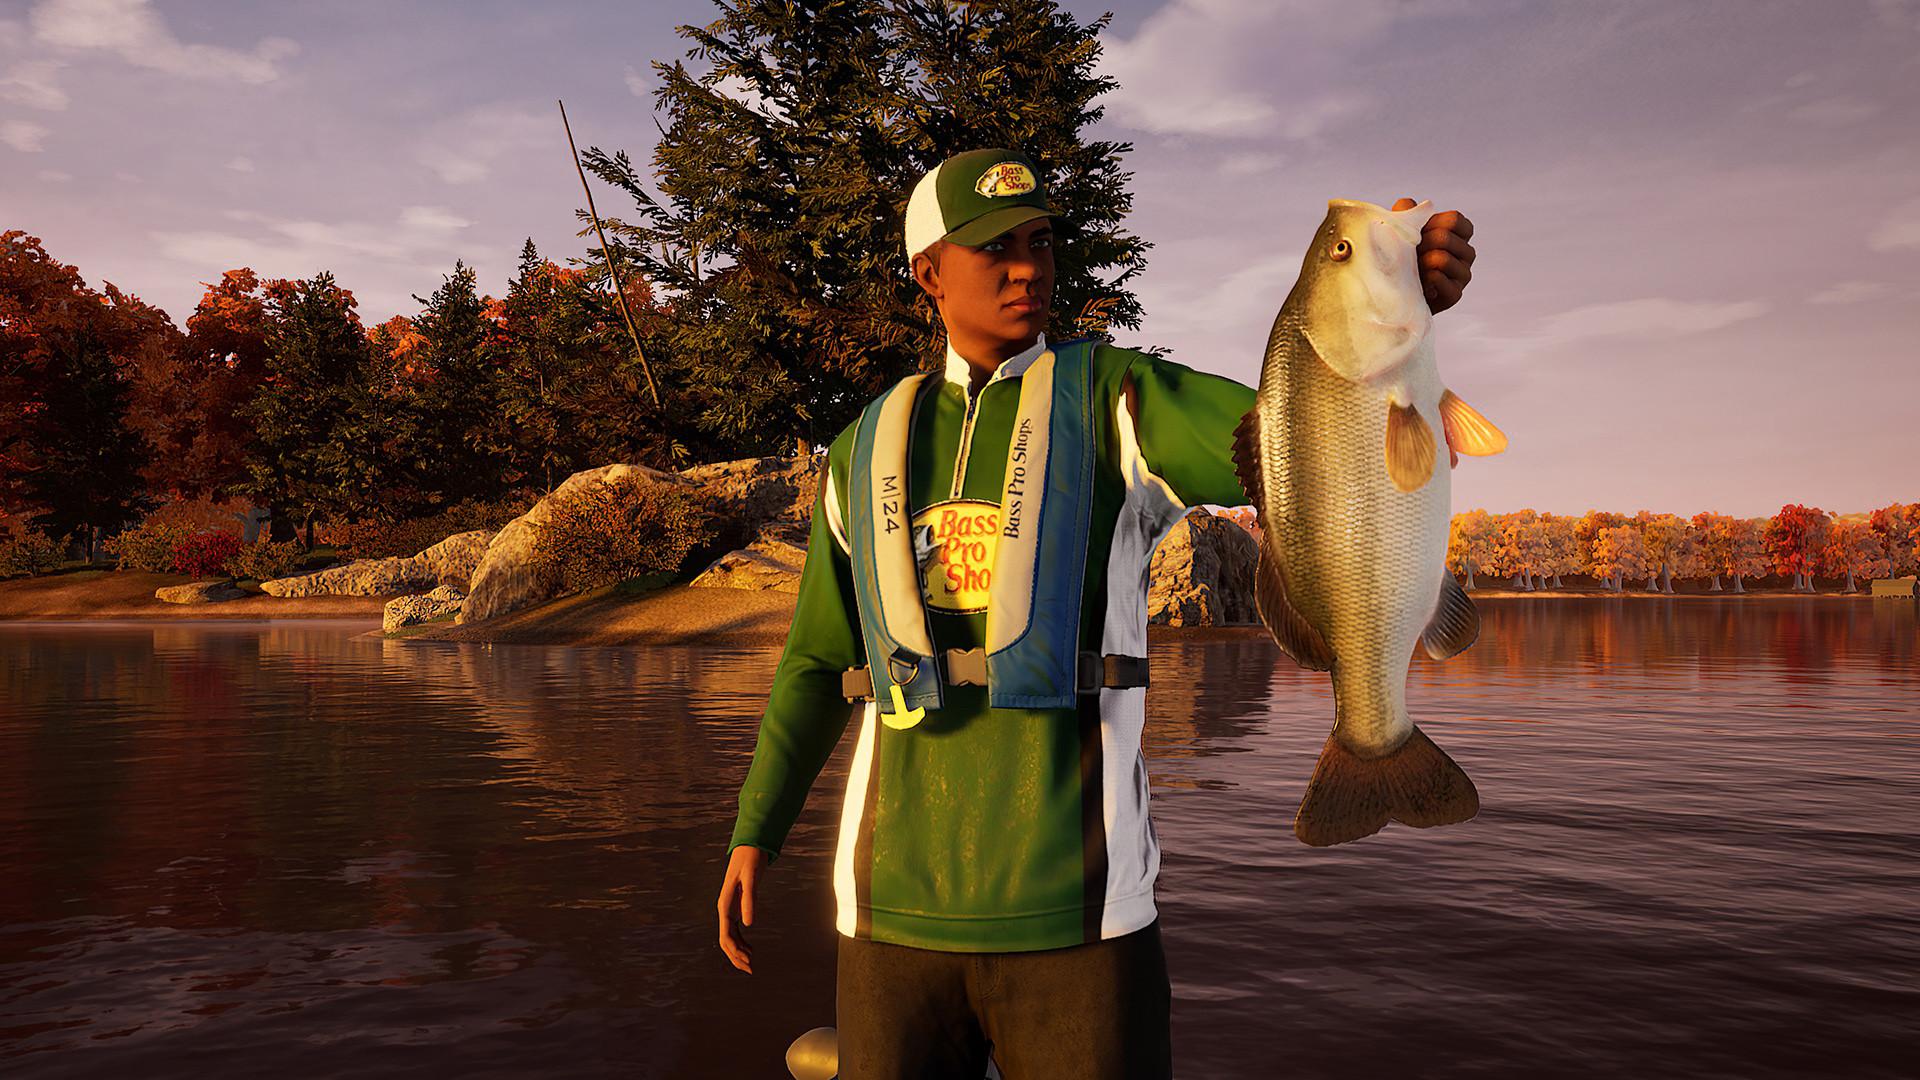 fishing-sim-world-bass-pro-shops-edition-pc-screenshot-04